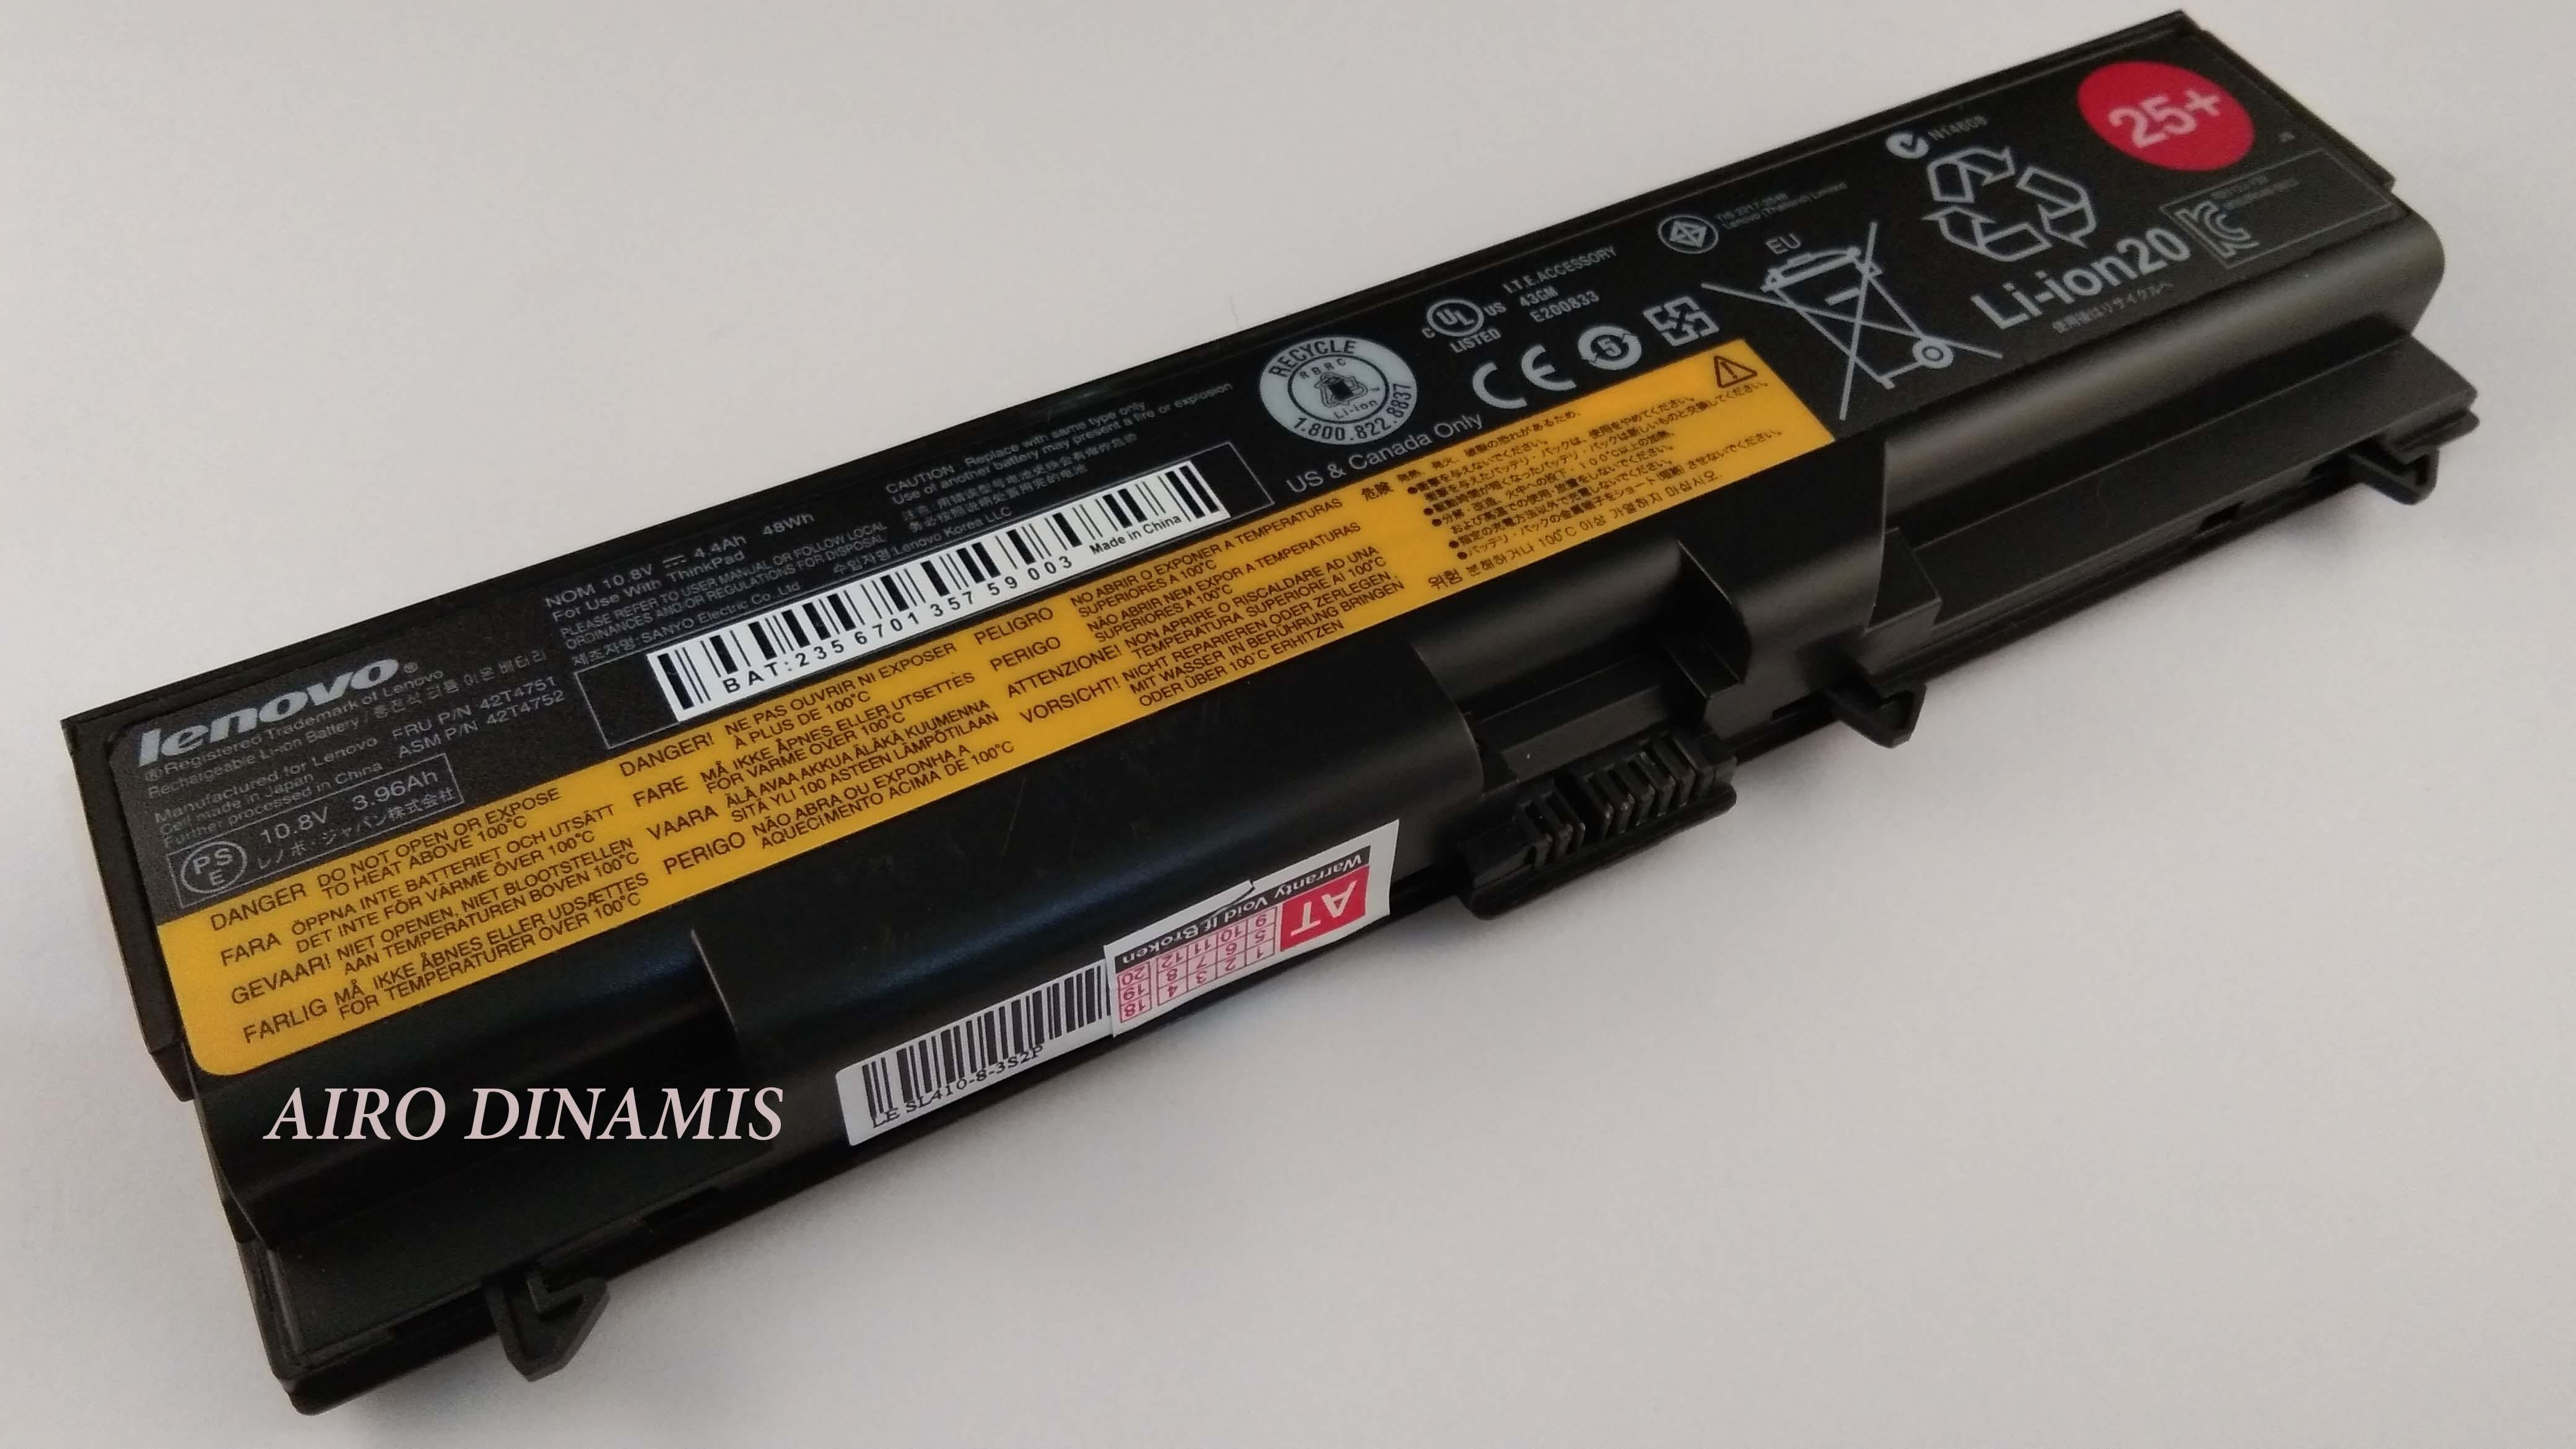 Baterai Laptop original IBM Lenovo Thinkpad Edge SL410 SL510 E420 E520 L410 L412 L420 L510 L512 L520 T410 T410i T420 T420i T510 T520 T520i